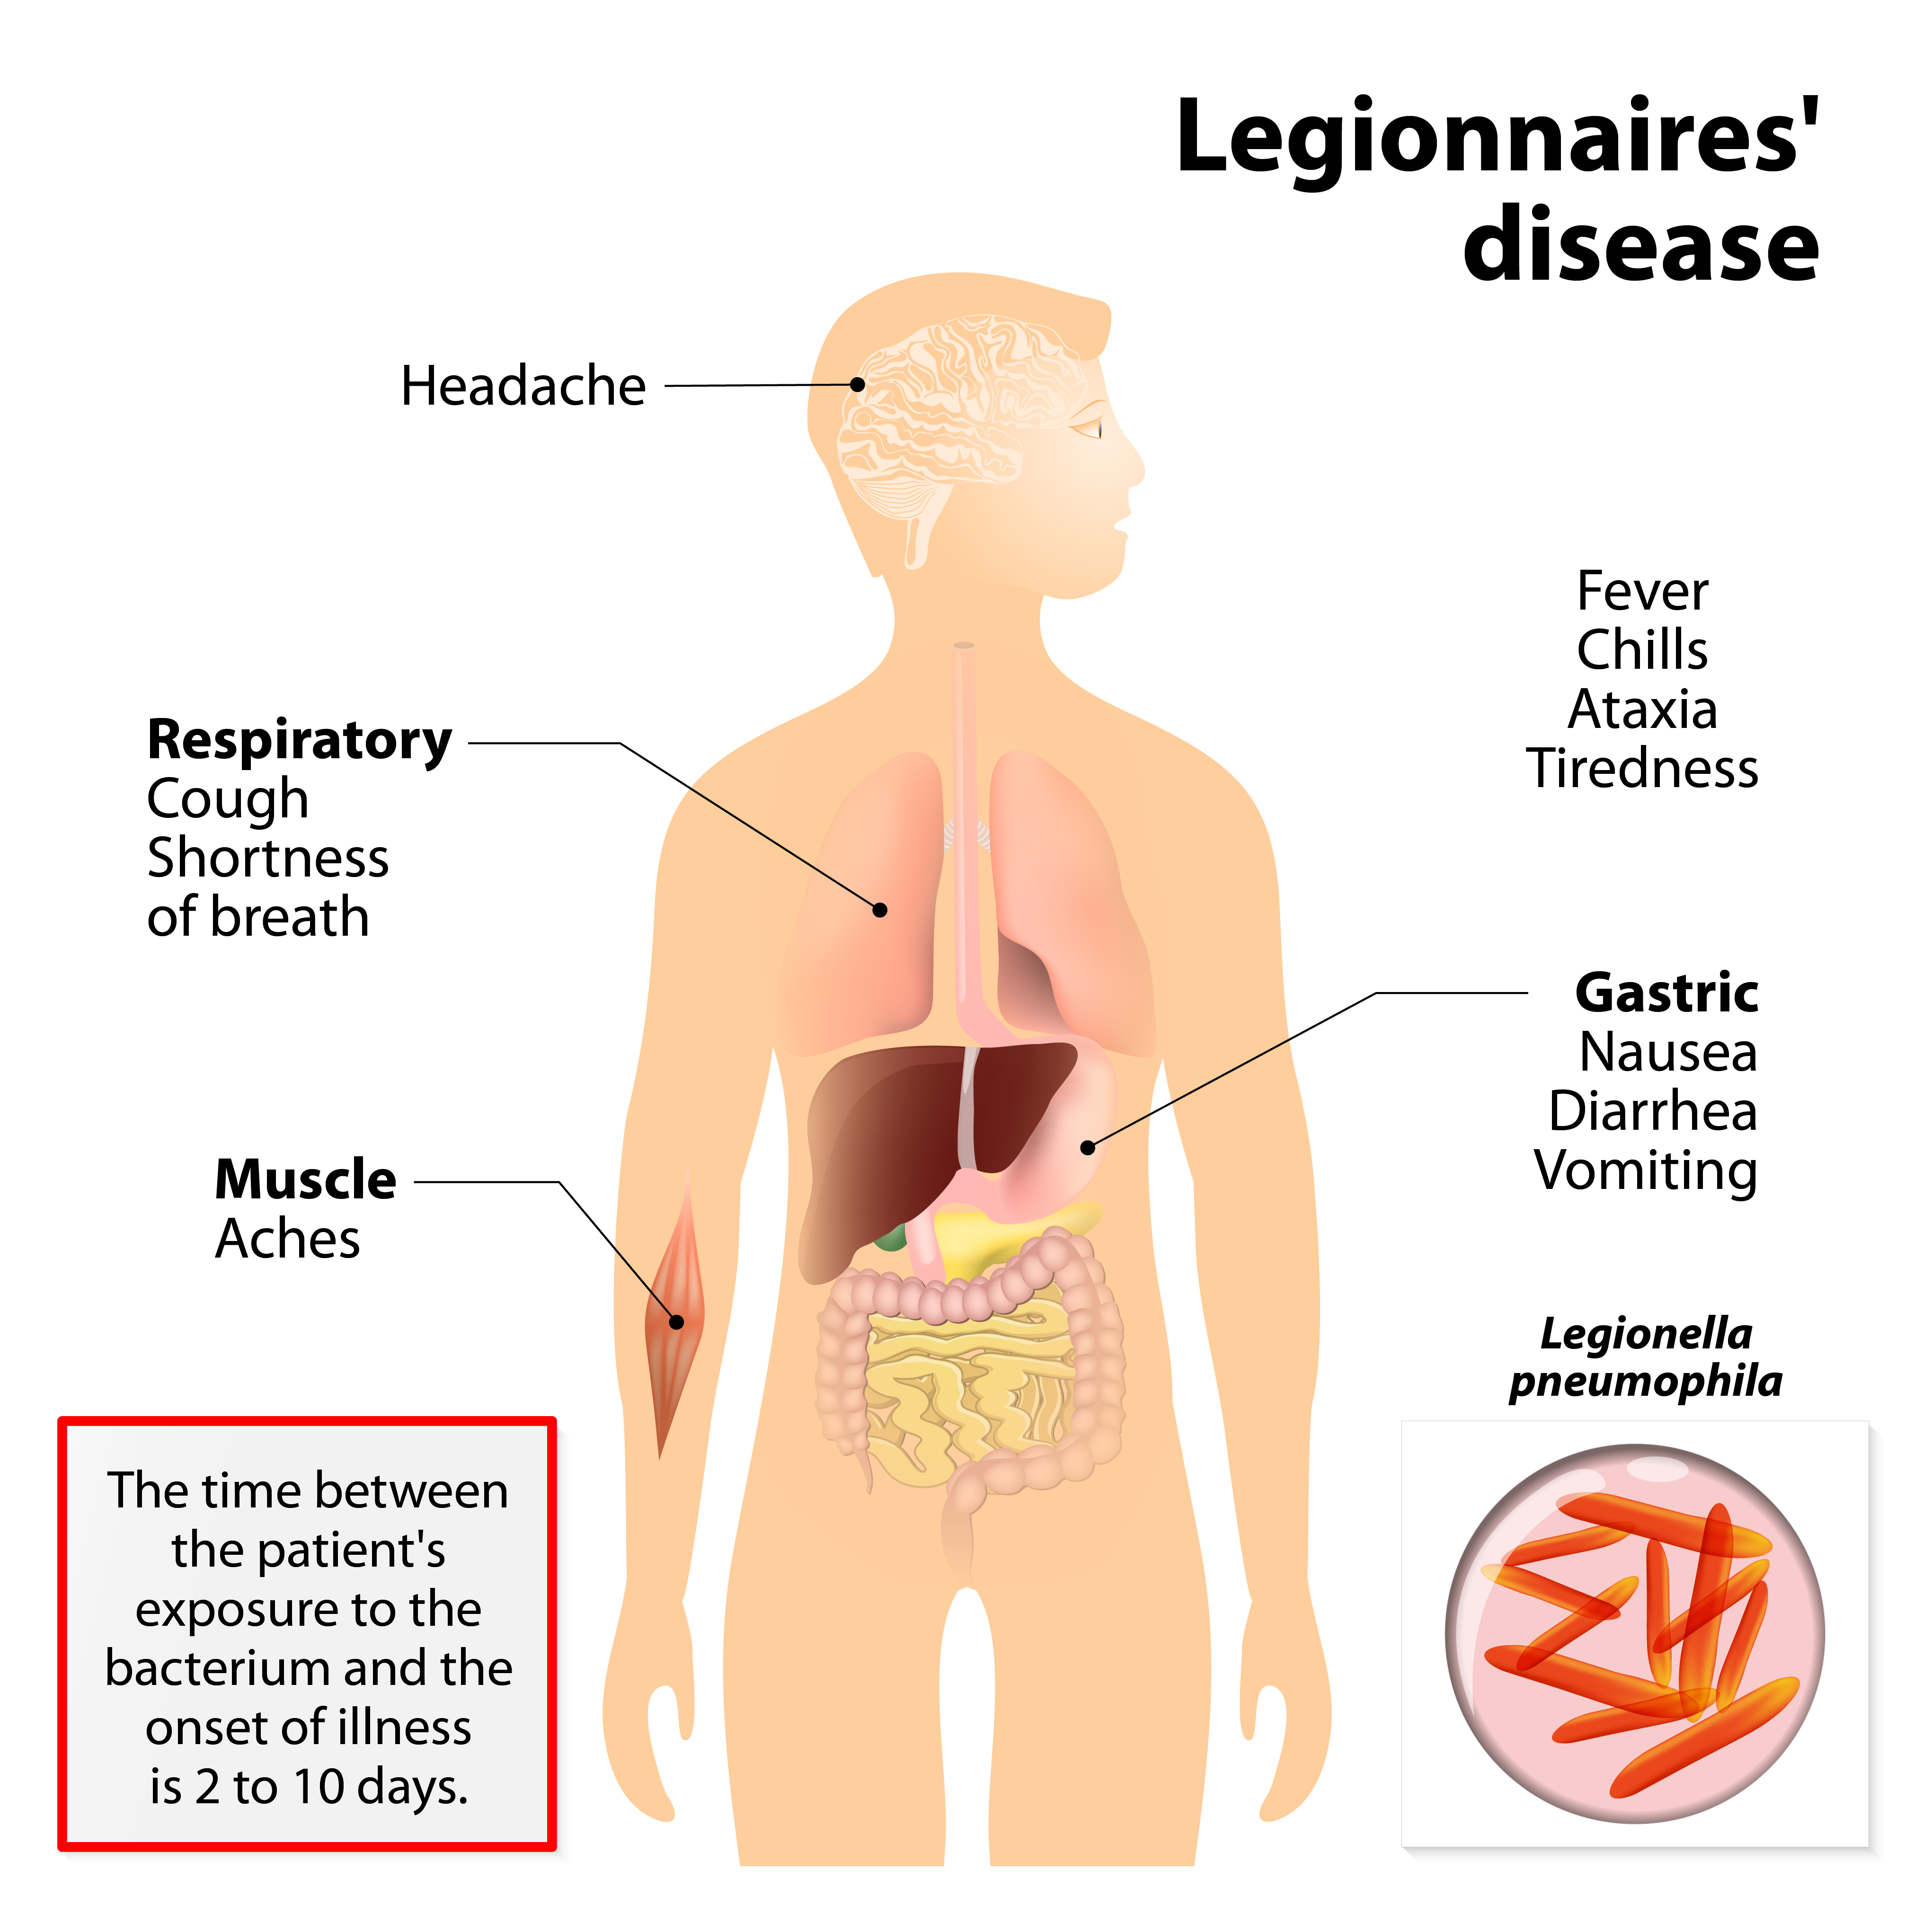 Legionnaires'disease